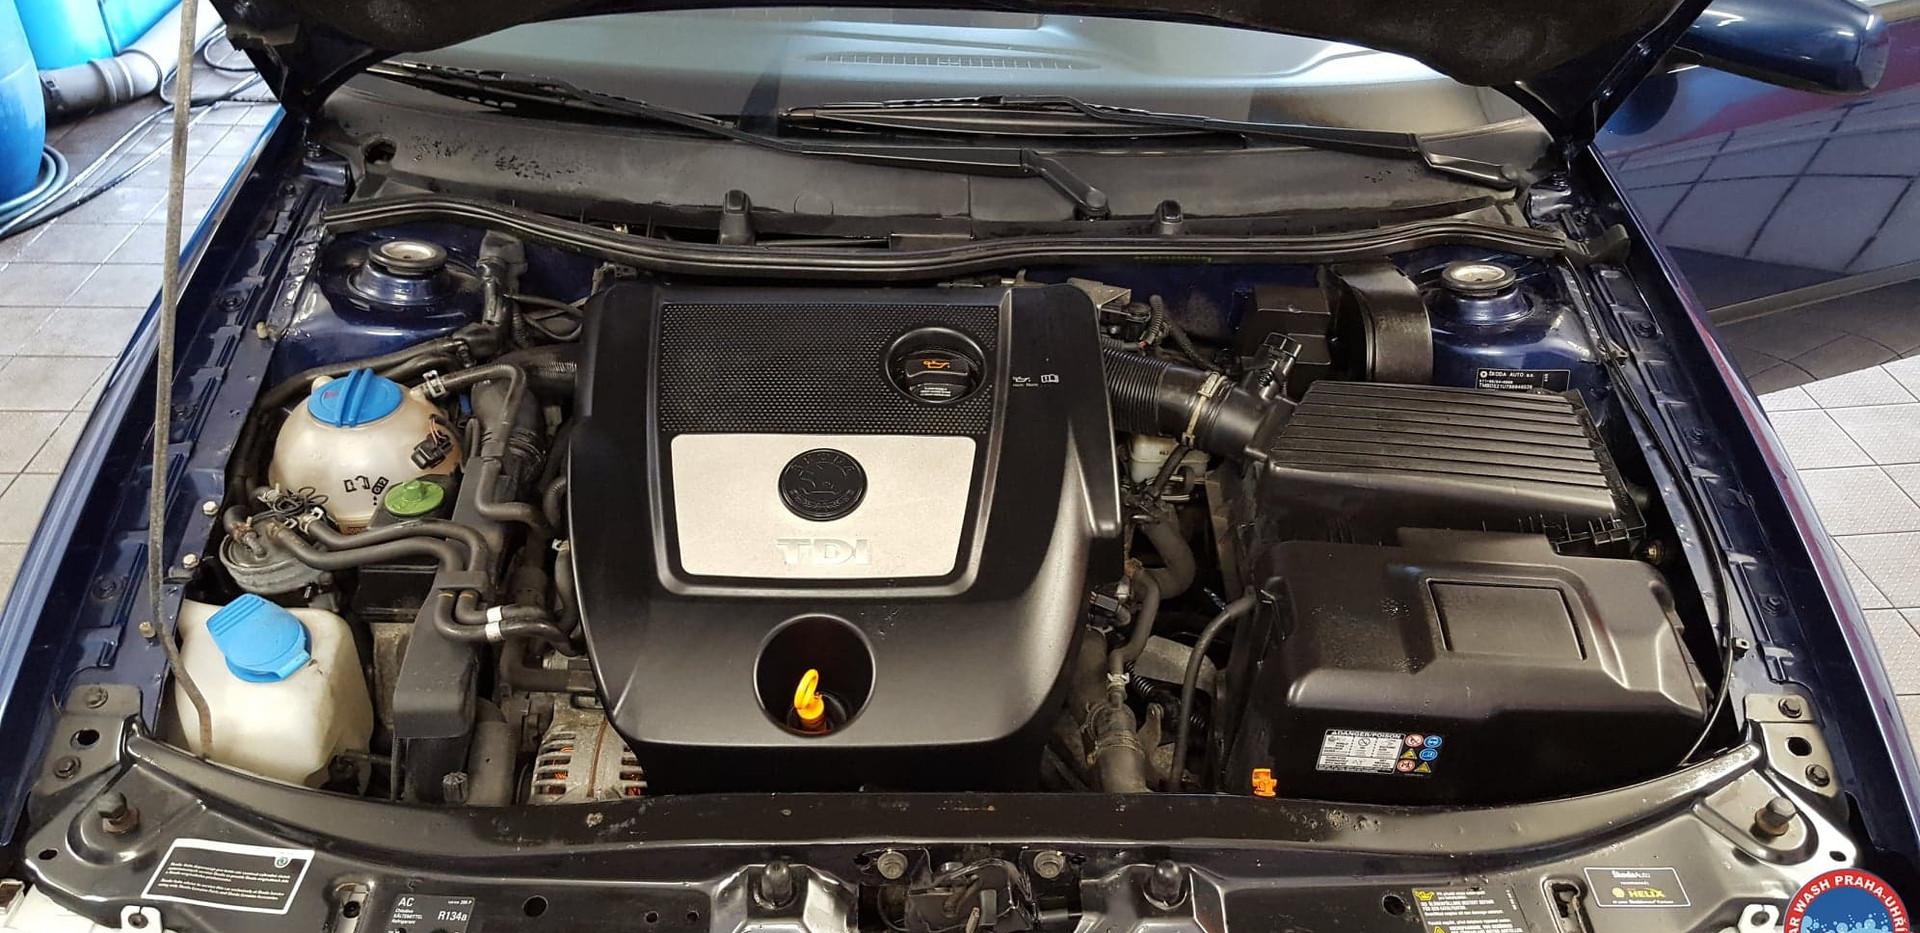 Car Wash - Cisteni motoru (17).jpg